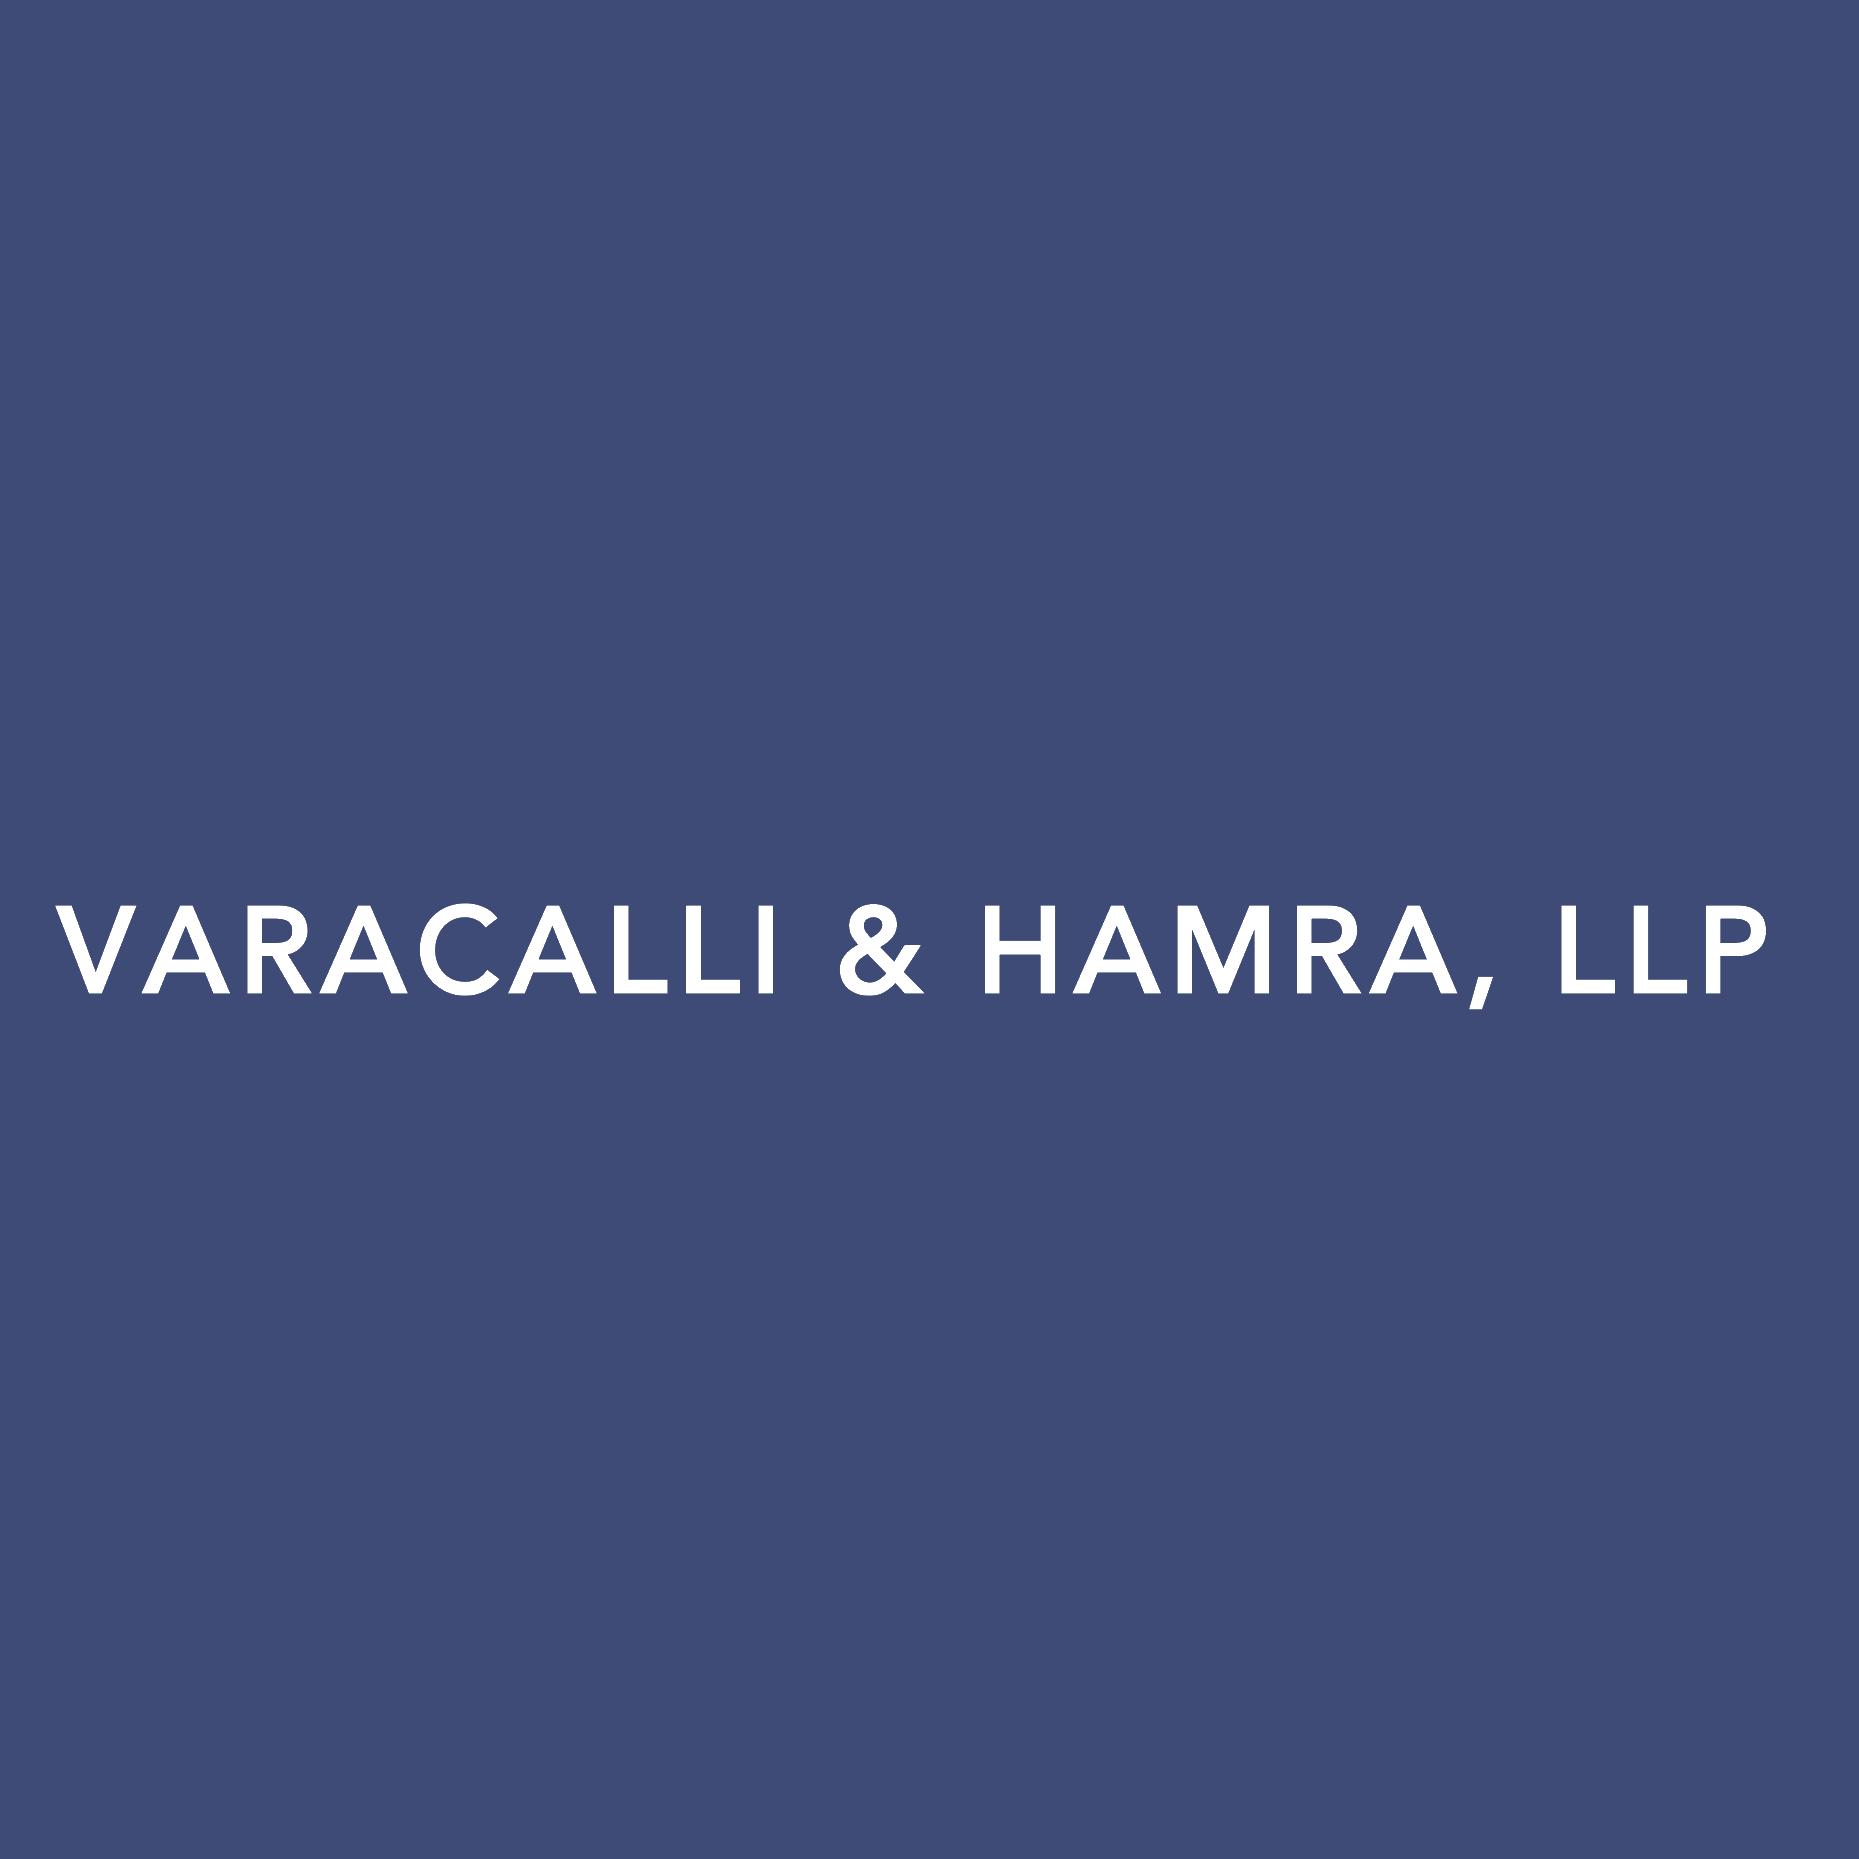 Varacalli & Hamra, LLP